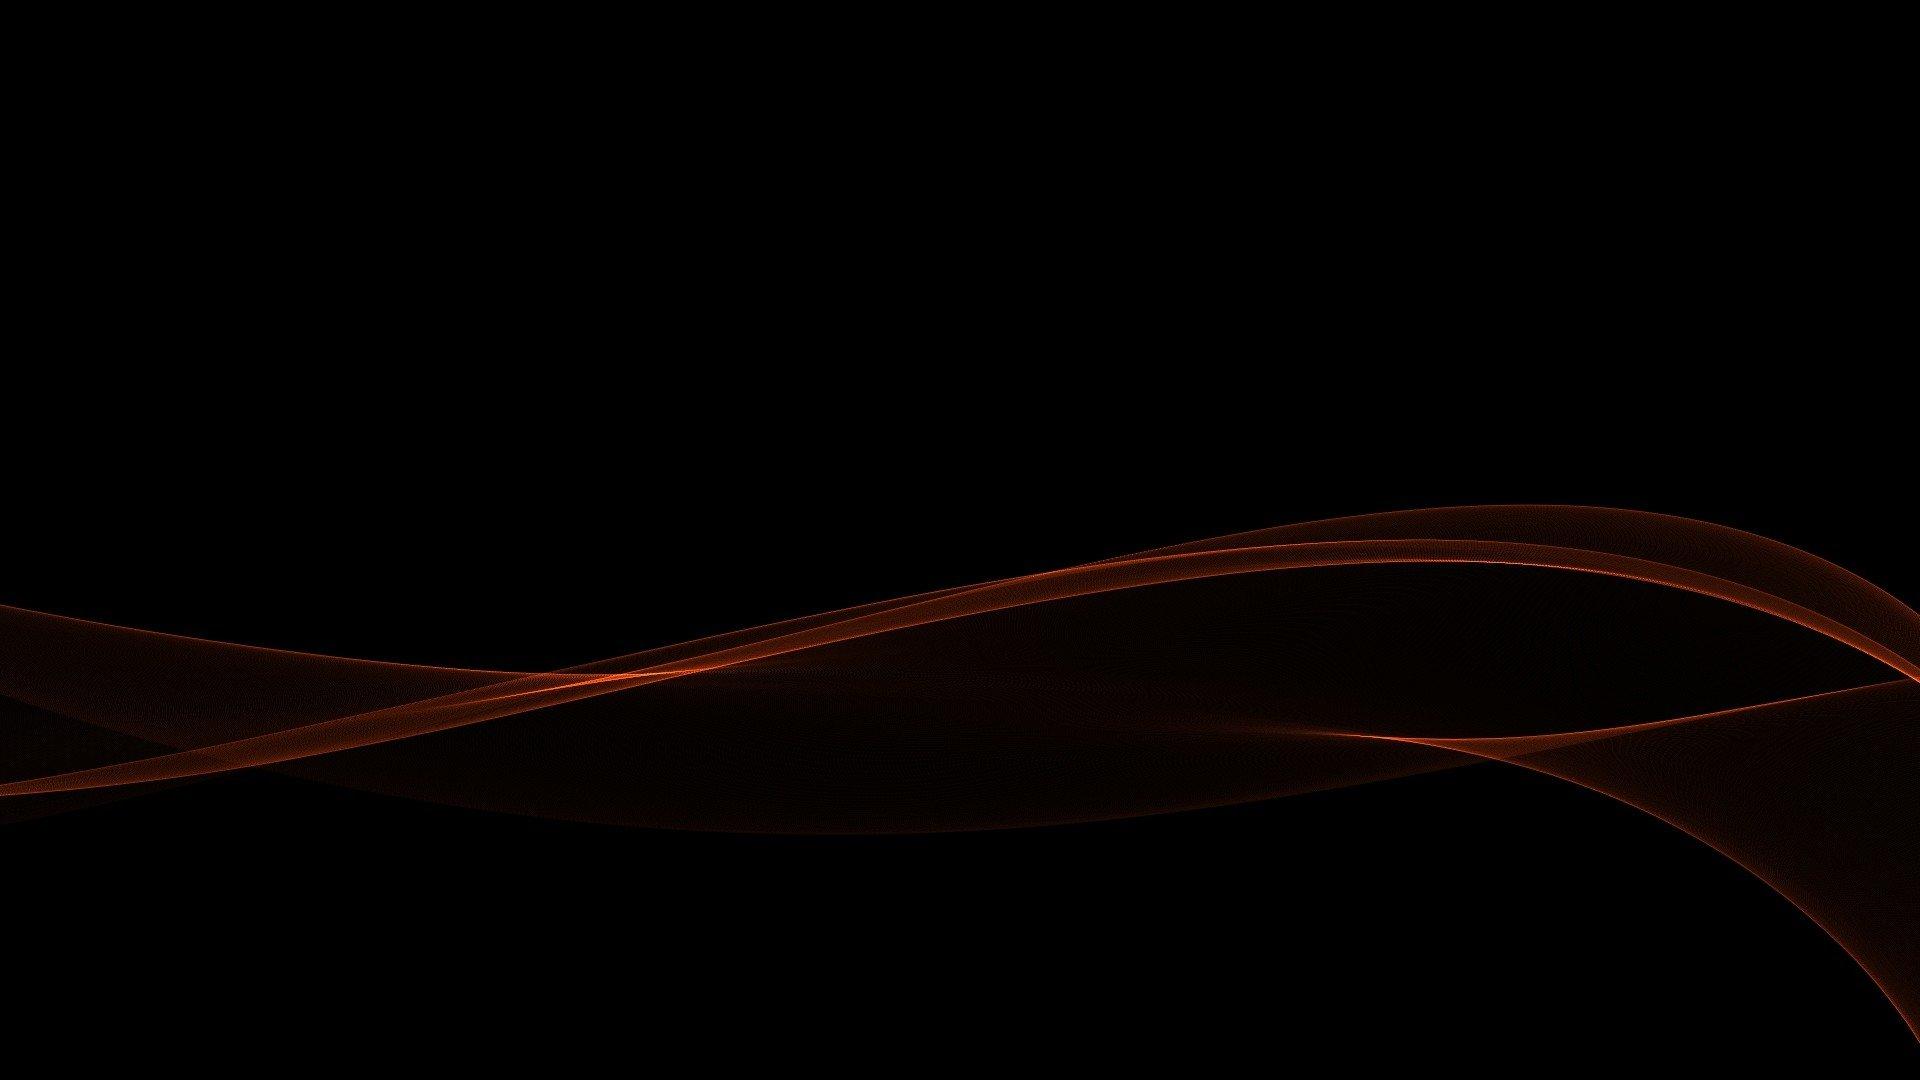 Red Gradient Minimalistic Waves Black Abstract Wallpaper Desktop